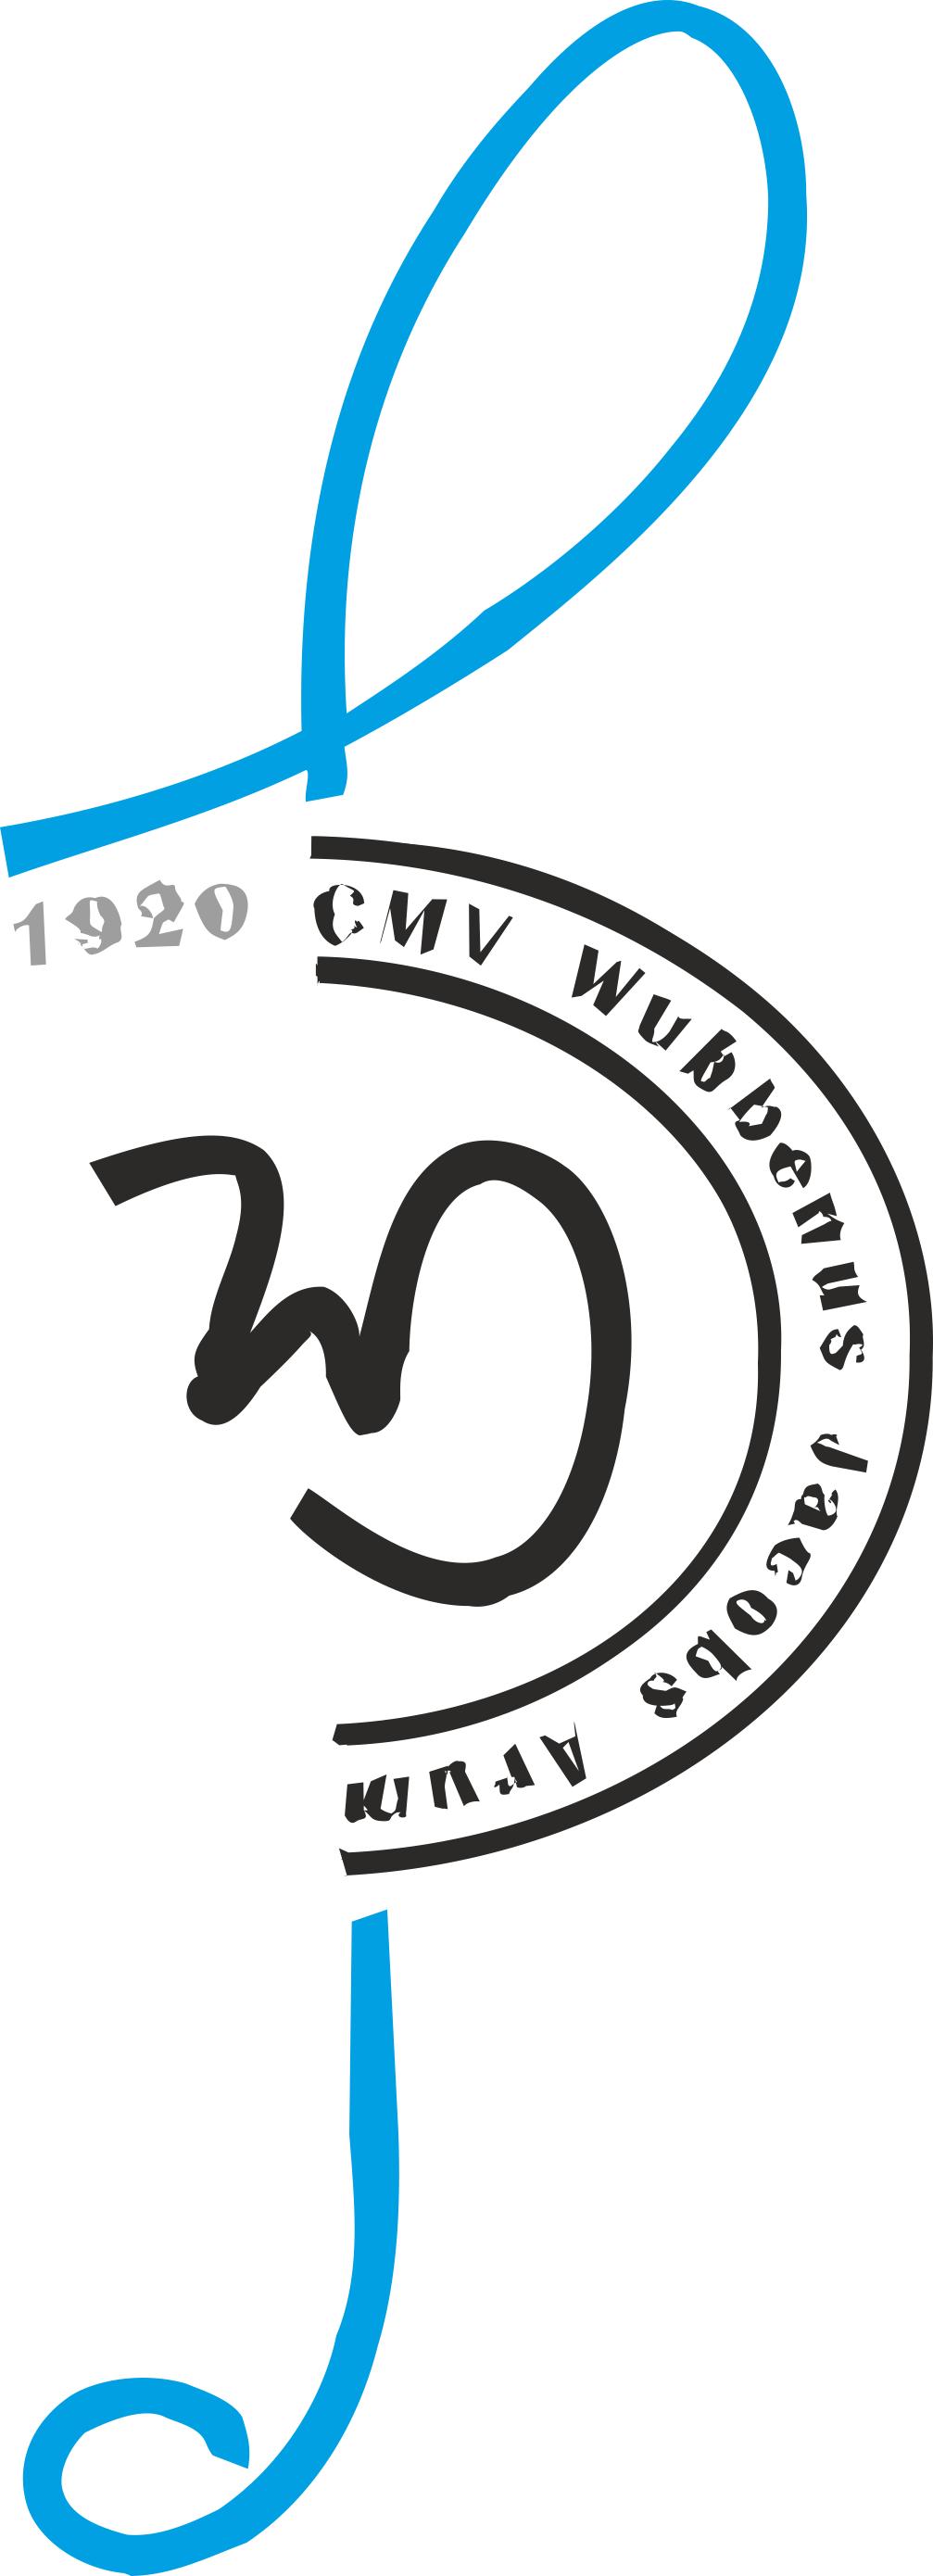 Wubbenus Jacobs